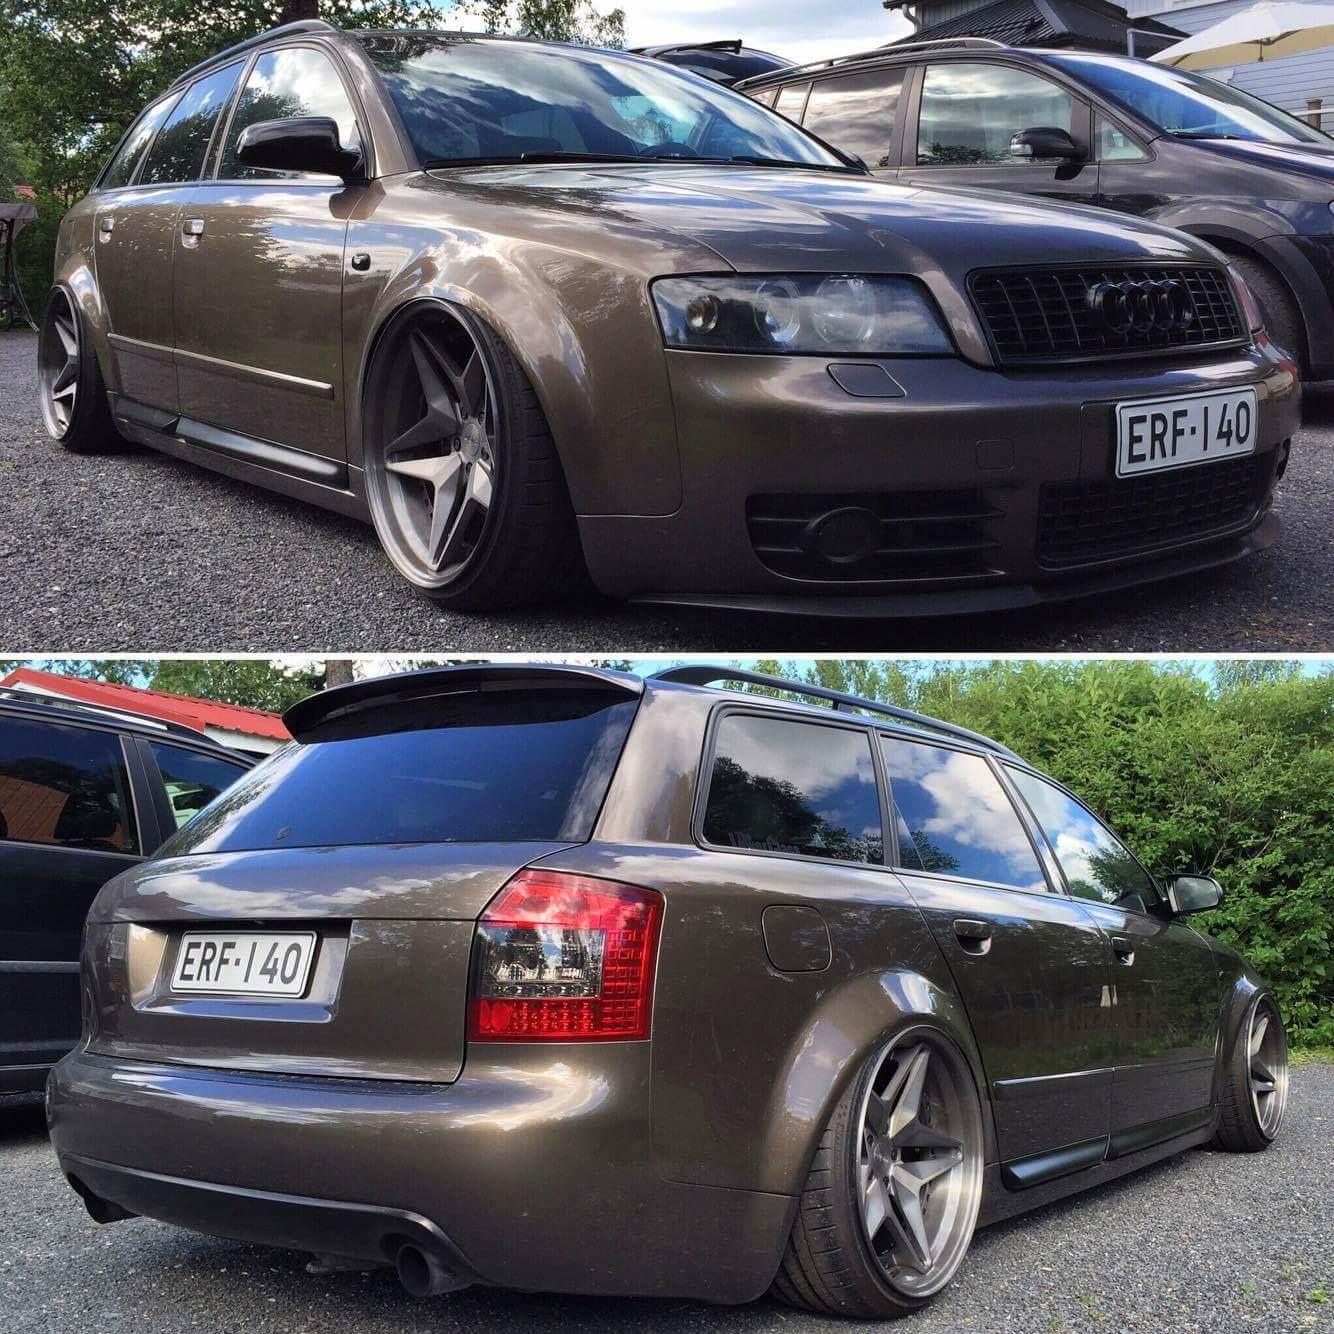 albanzo: Audi A4PR Avant 1.8T quattro '04 105qp2s